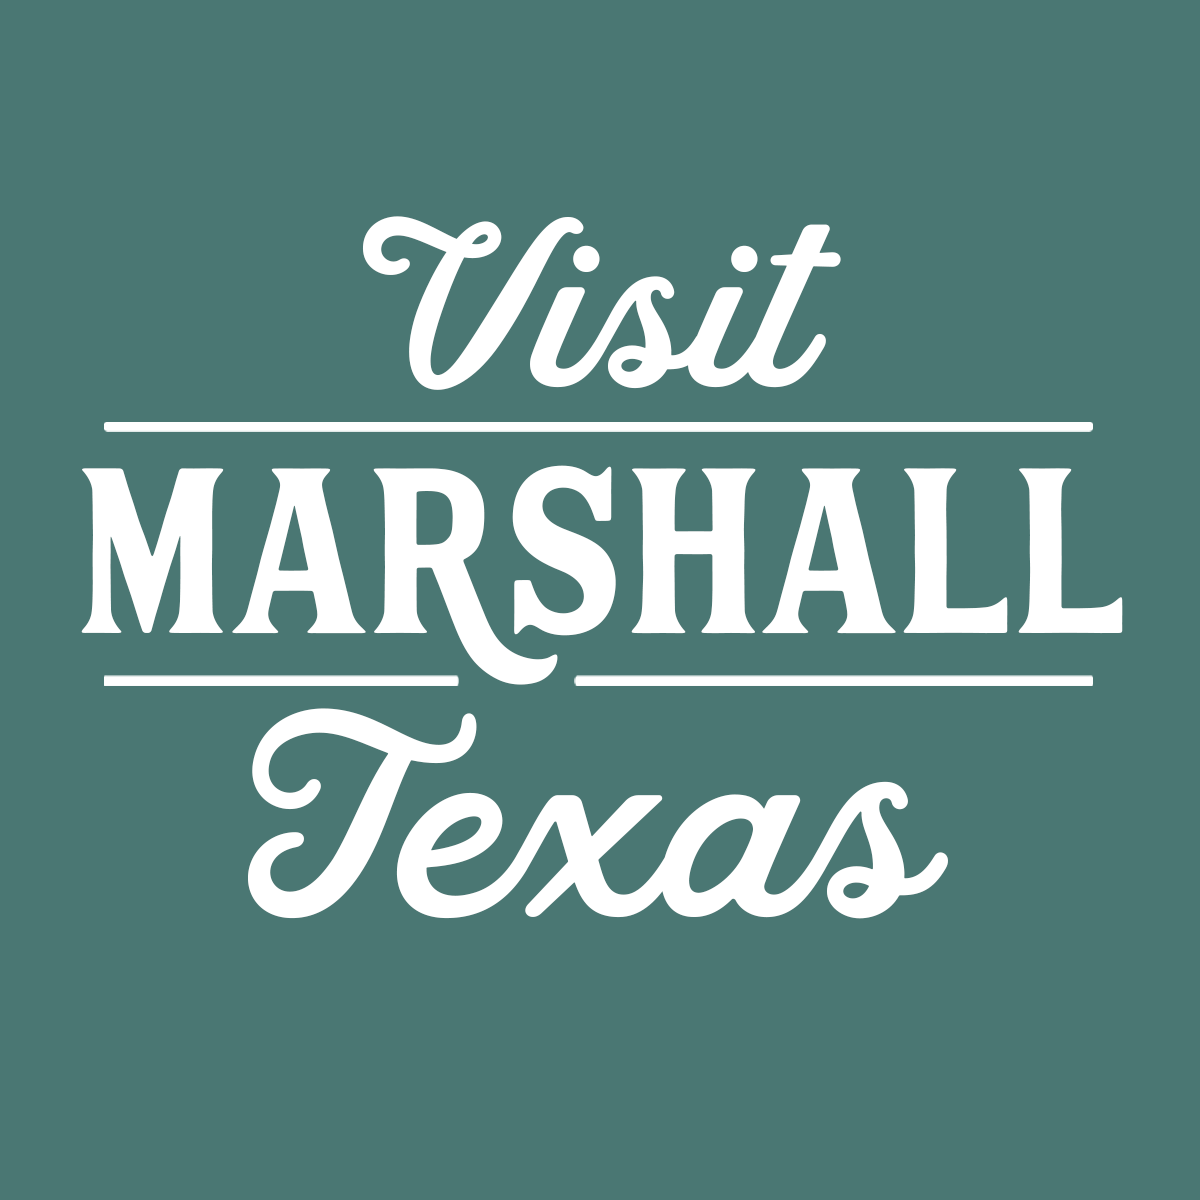 Visit Marshall Texas